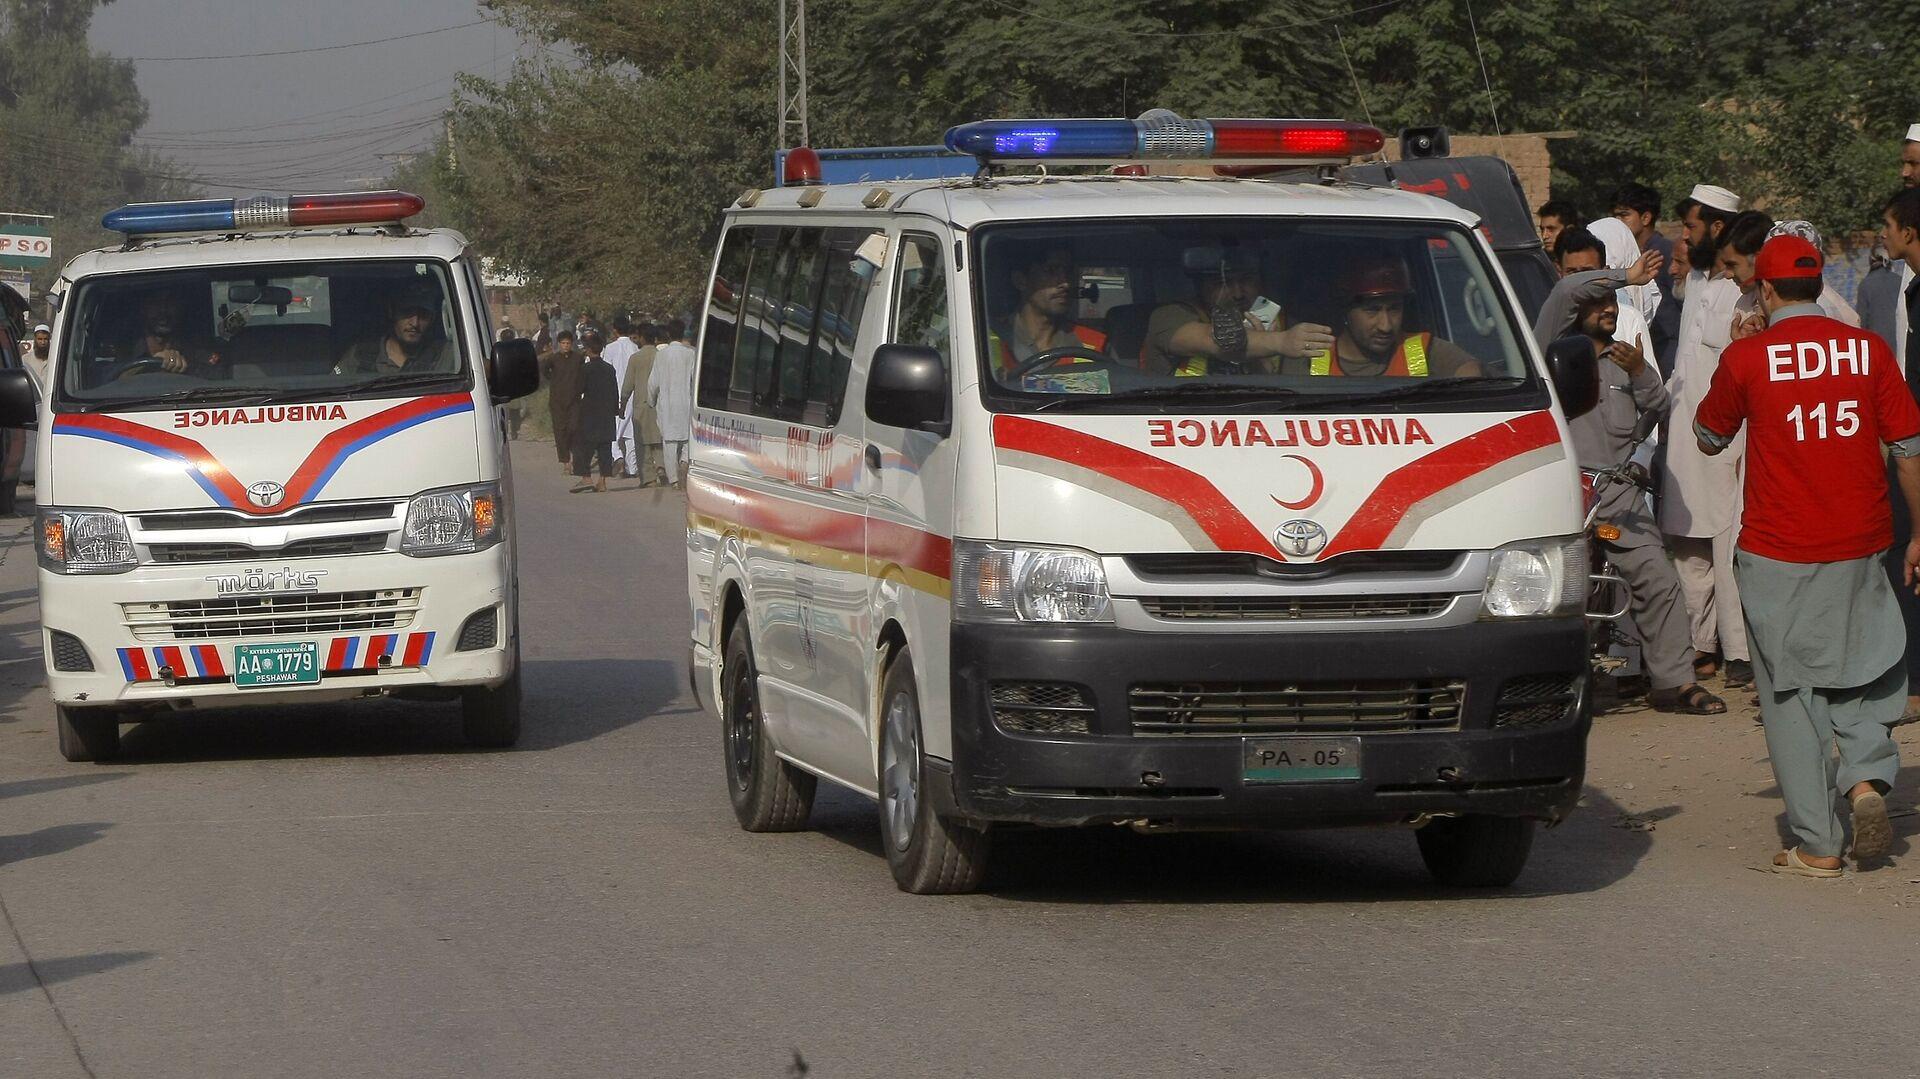 Pakistan ambulance. (File) - Sputnik International, 1920, 26.09.2021